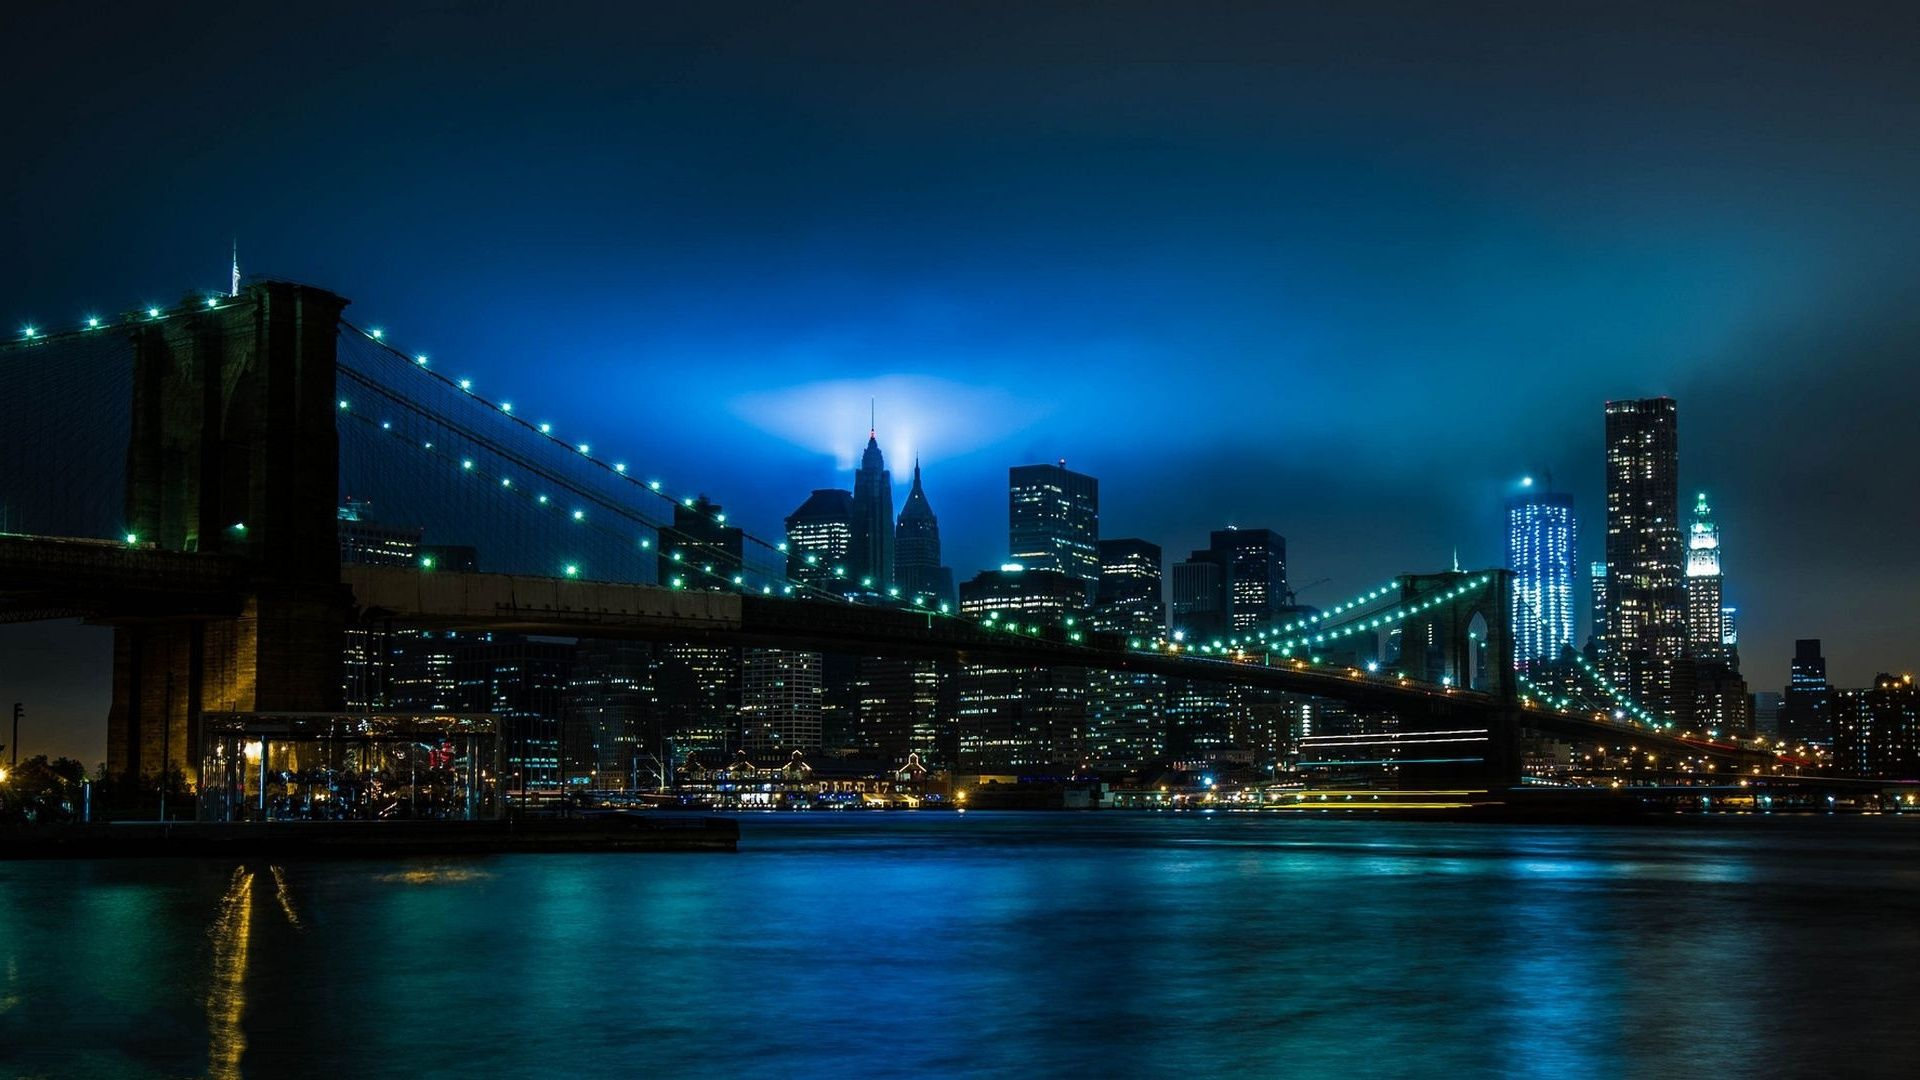 Brooklyn Bridge At Night Background Bridge Wallpaper New York Wallpaper New York Night